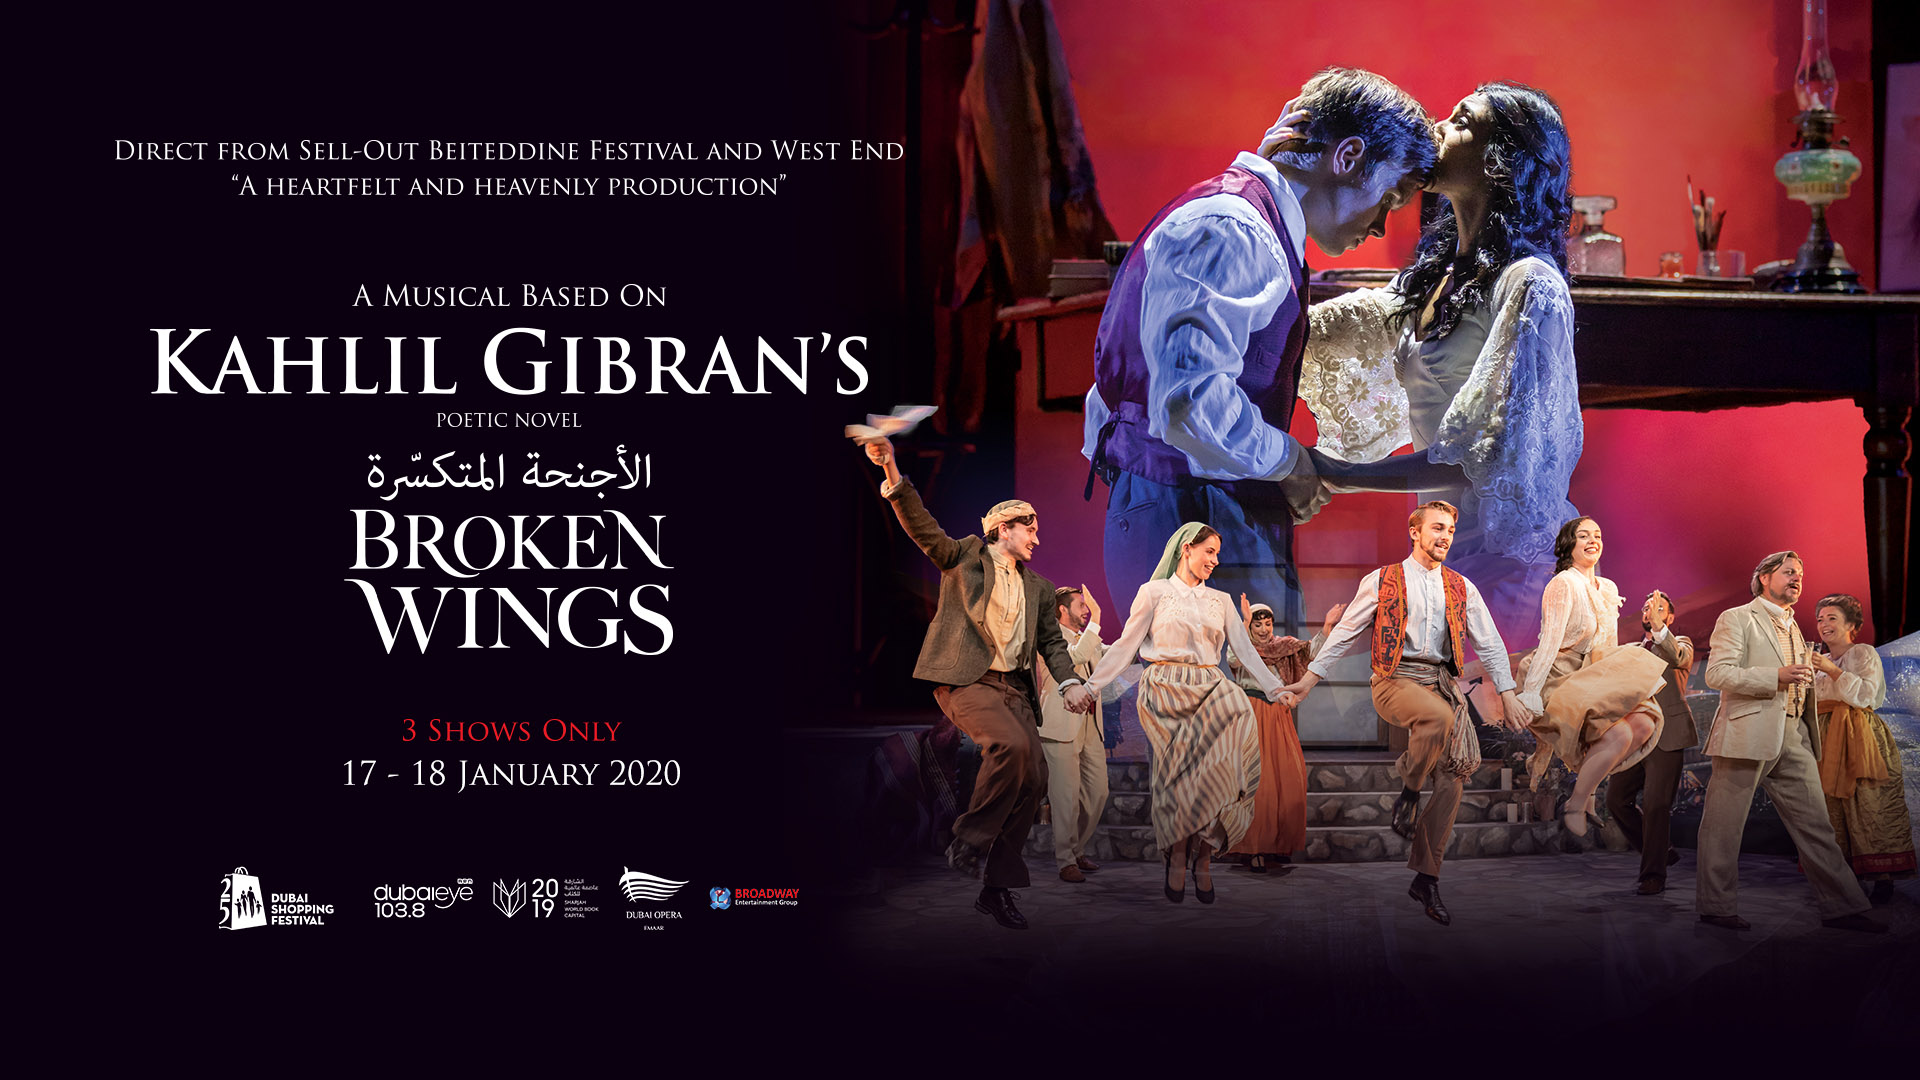 Play: Broken Wings on Jan 17th – 18th at Dubai Opera